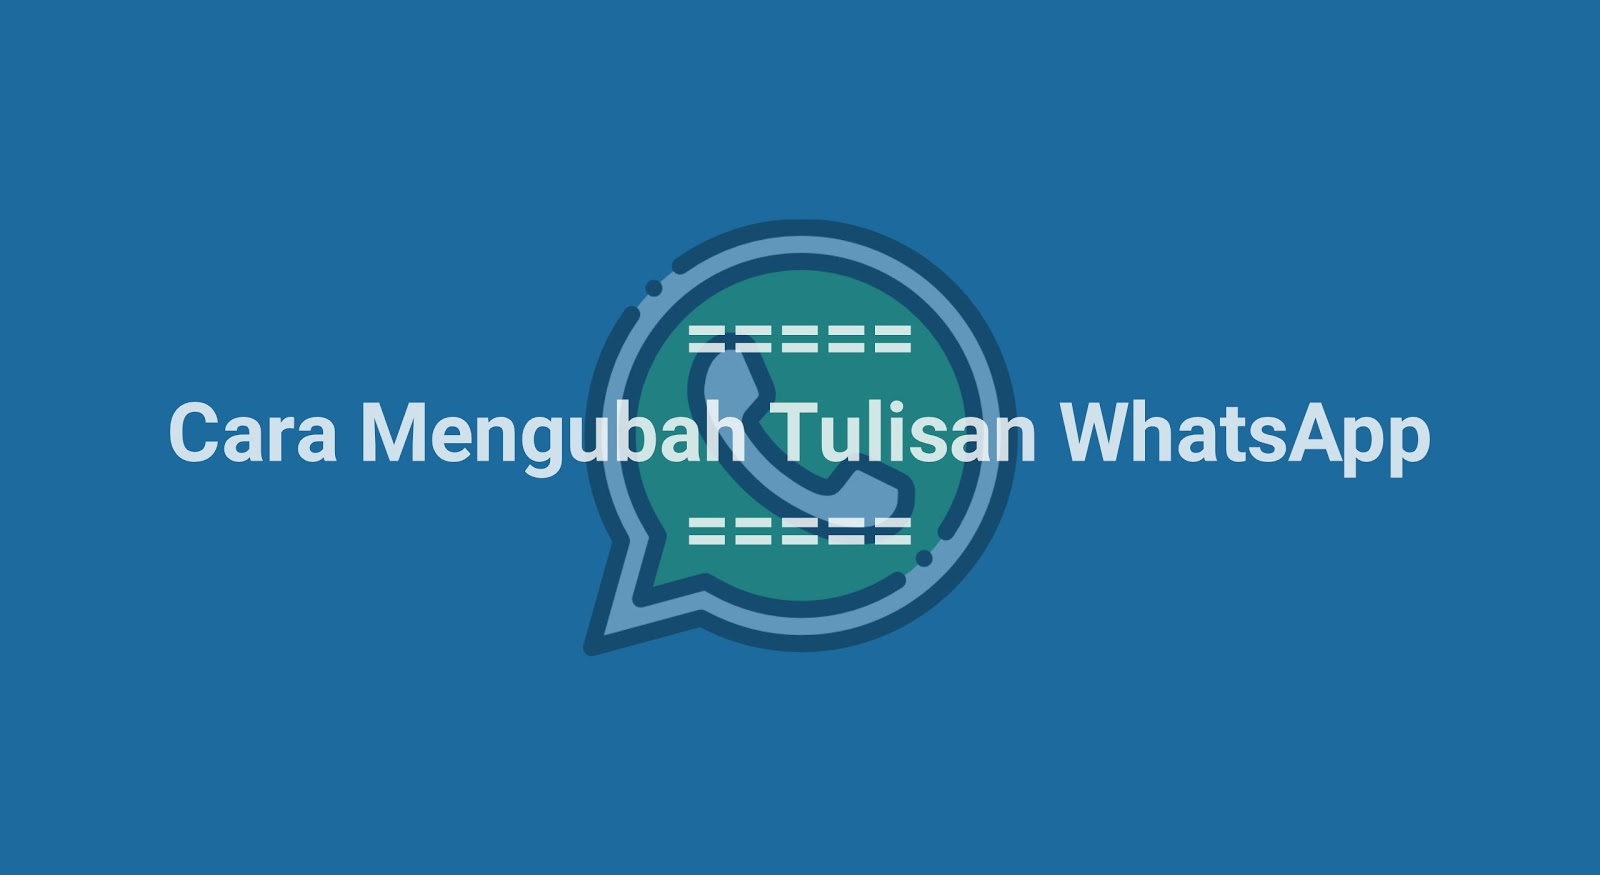 Cara Mengubah Tulisan WhatsApp